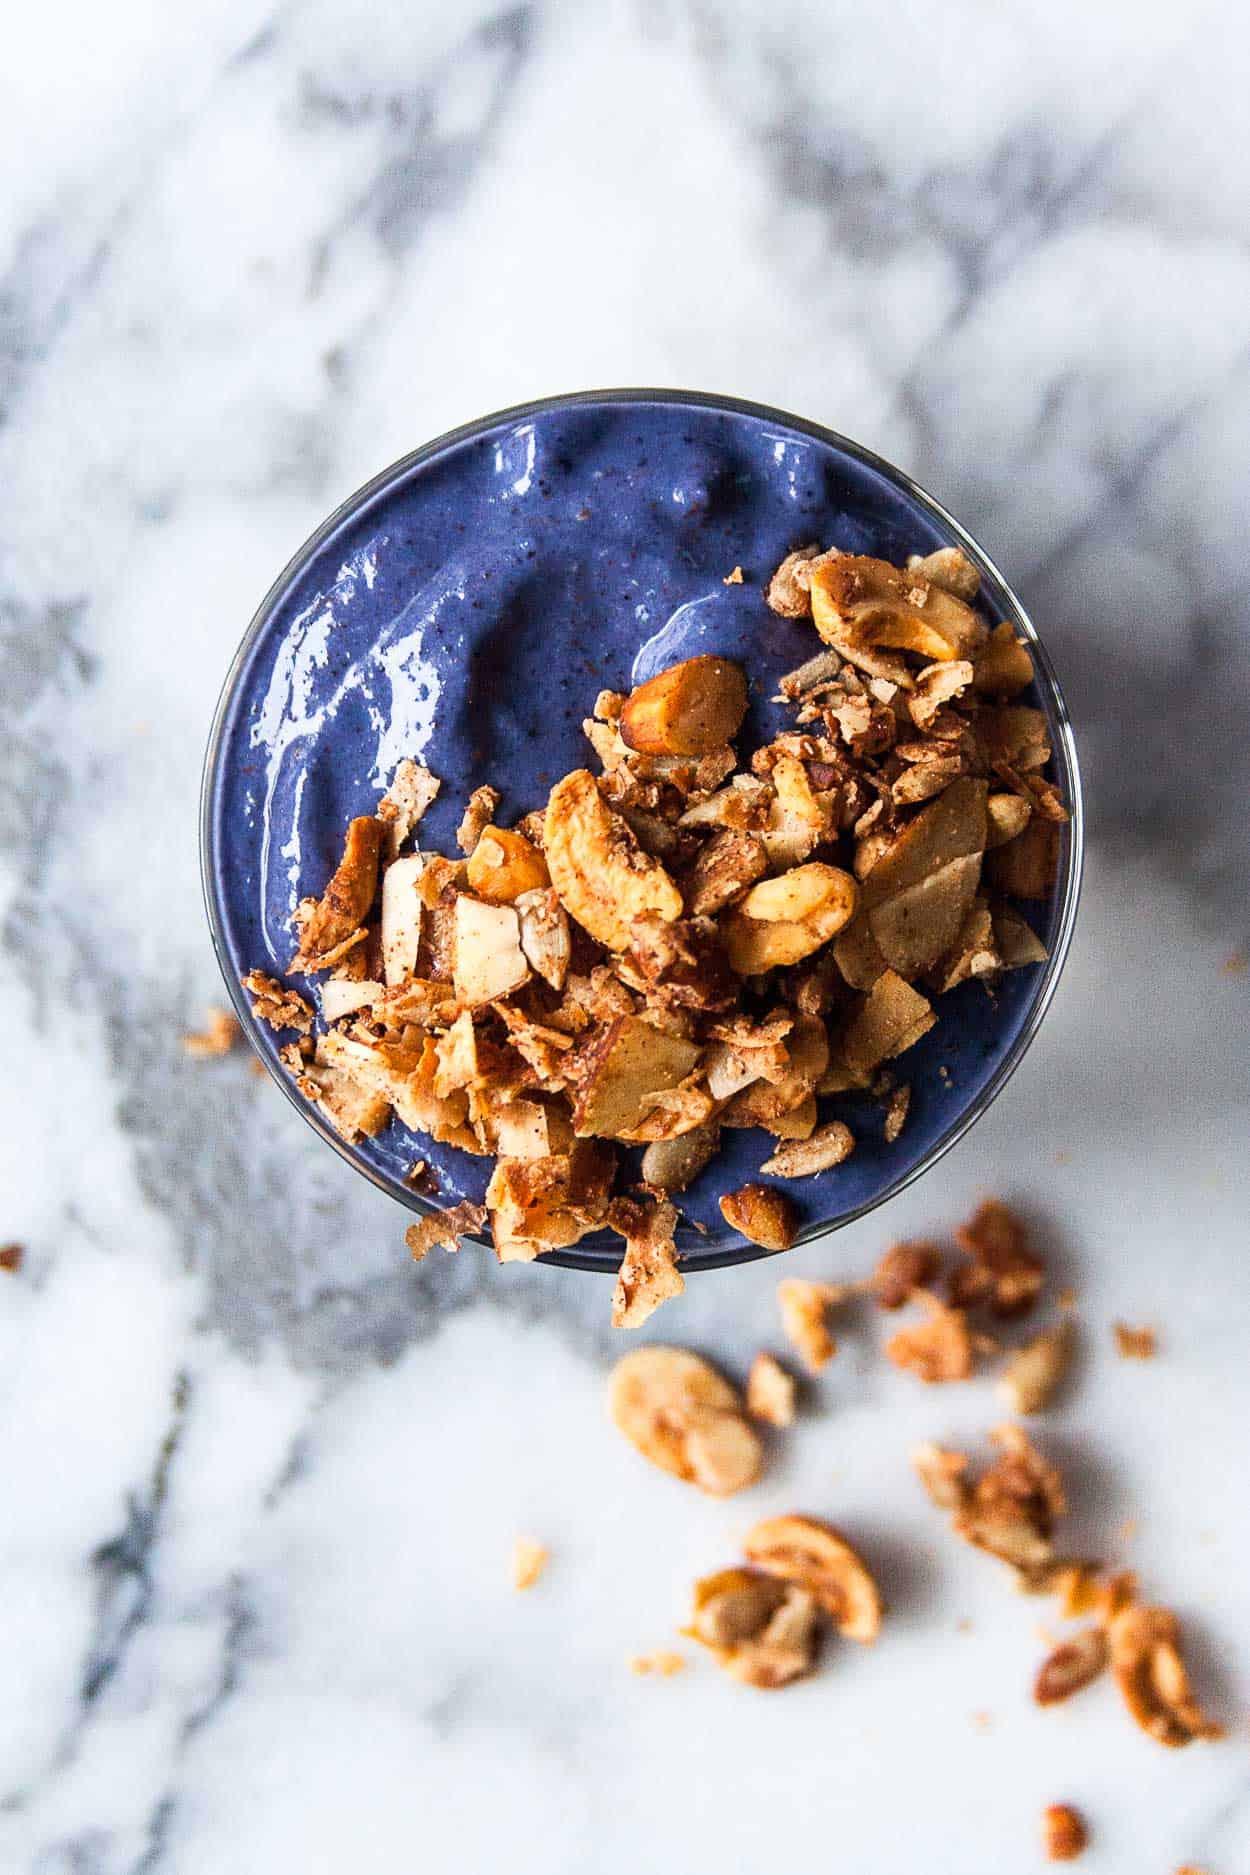 Blueberry Muffin Smoothie | #vitamix #granola #grainfree #Nuzest #peaprotein #fab4smoothie #smoothie | hungrybynature.com